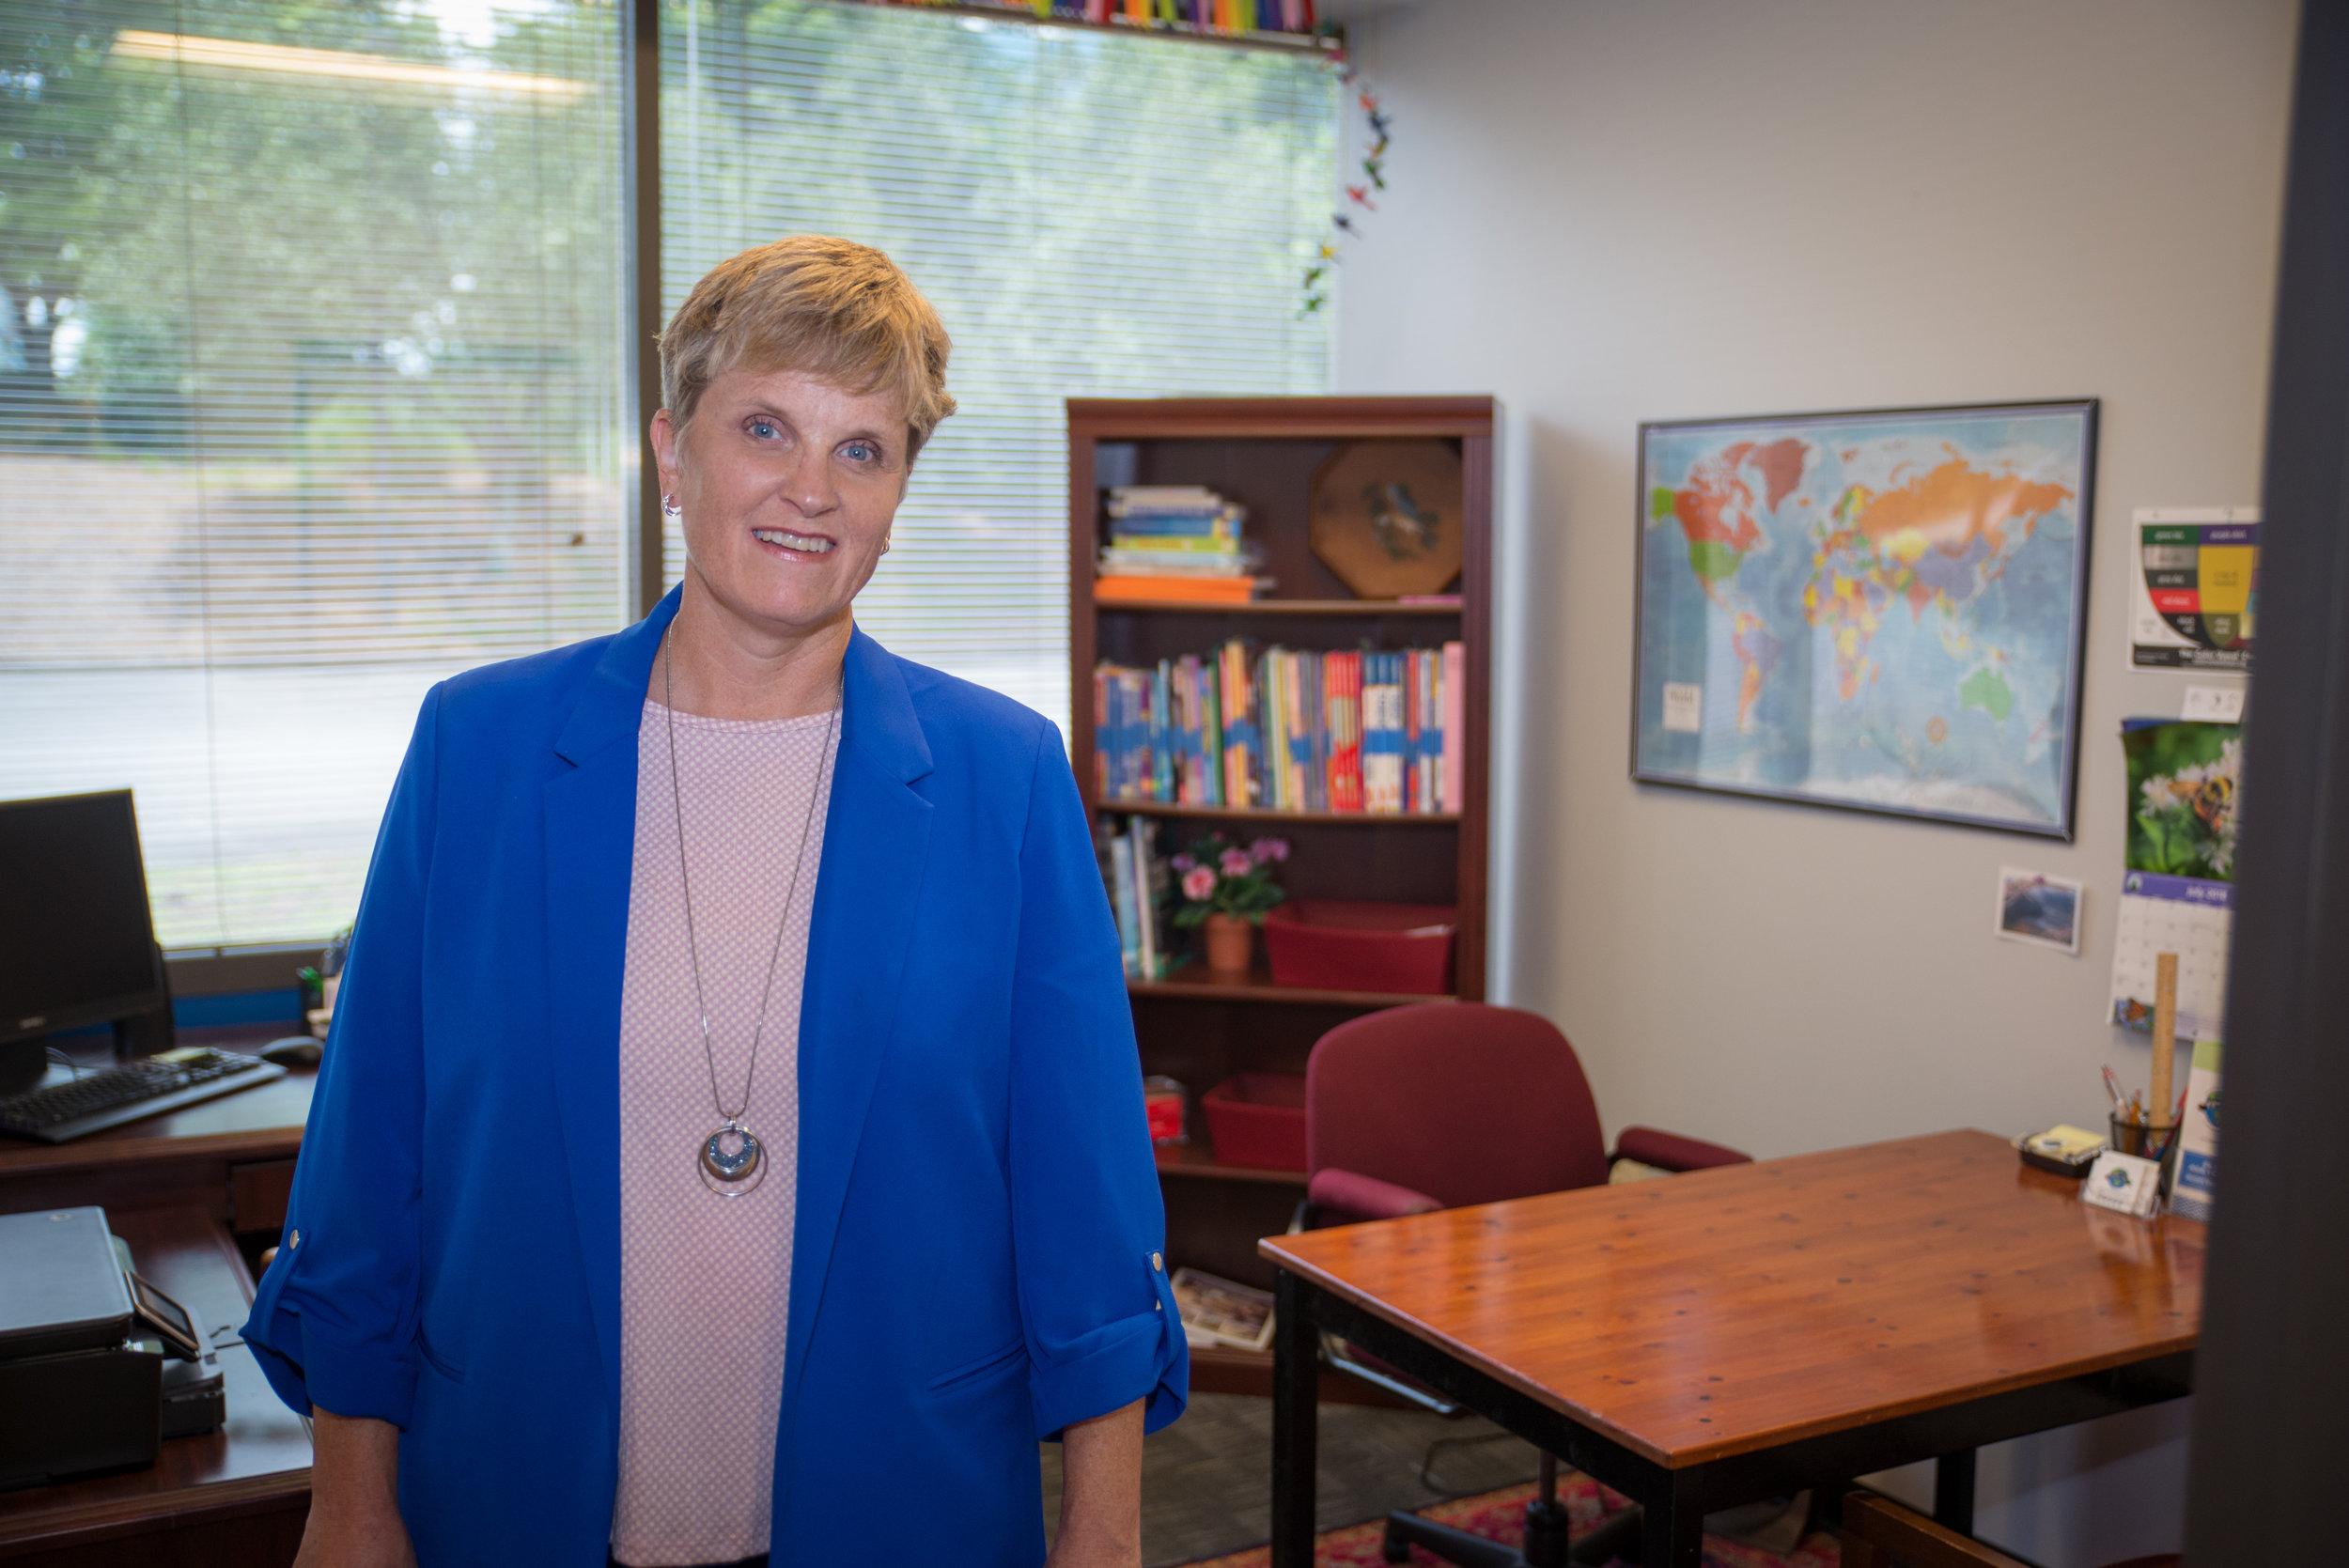 Liz Bigler, founder of Bigler ESL offering English lessons to Japanese speakers of English